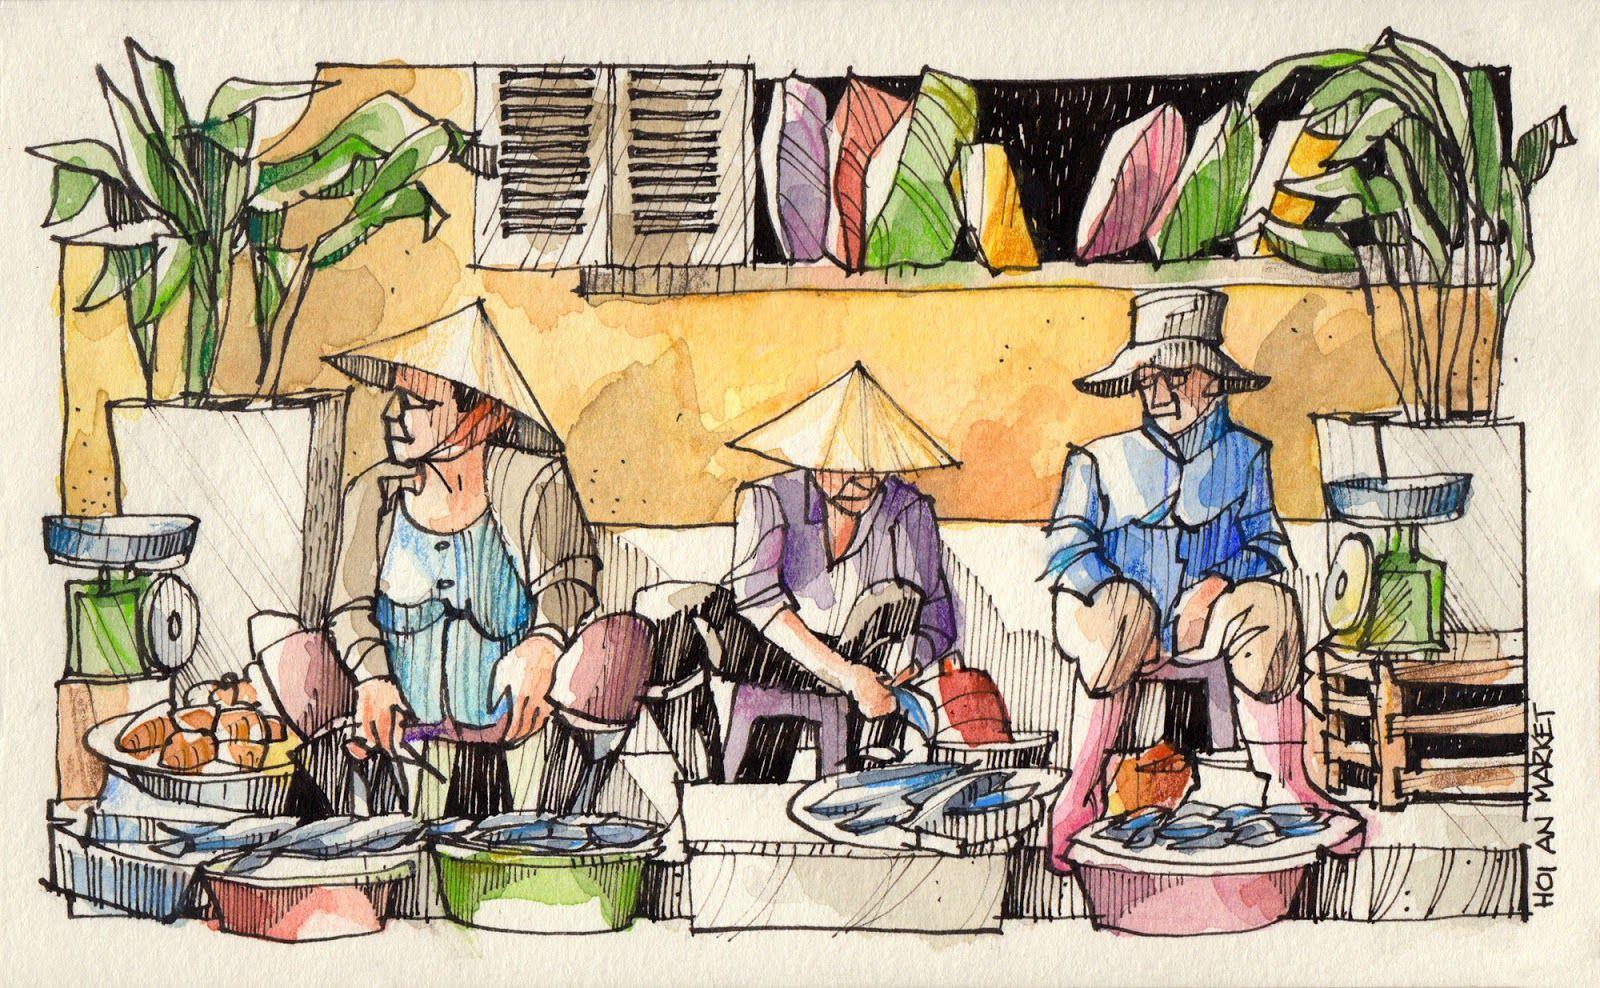 Базар картинки нарисованные карандашом